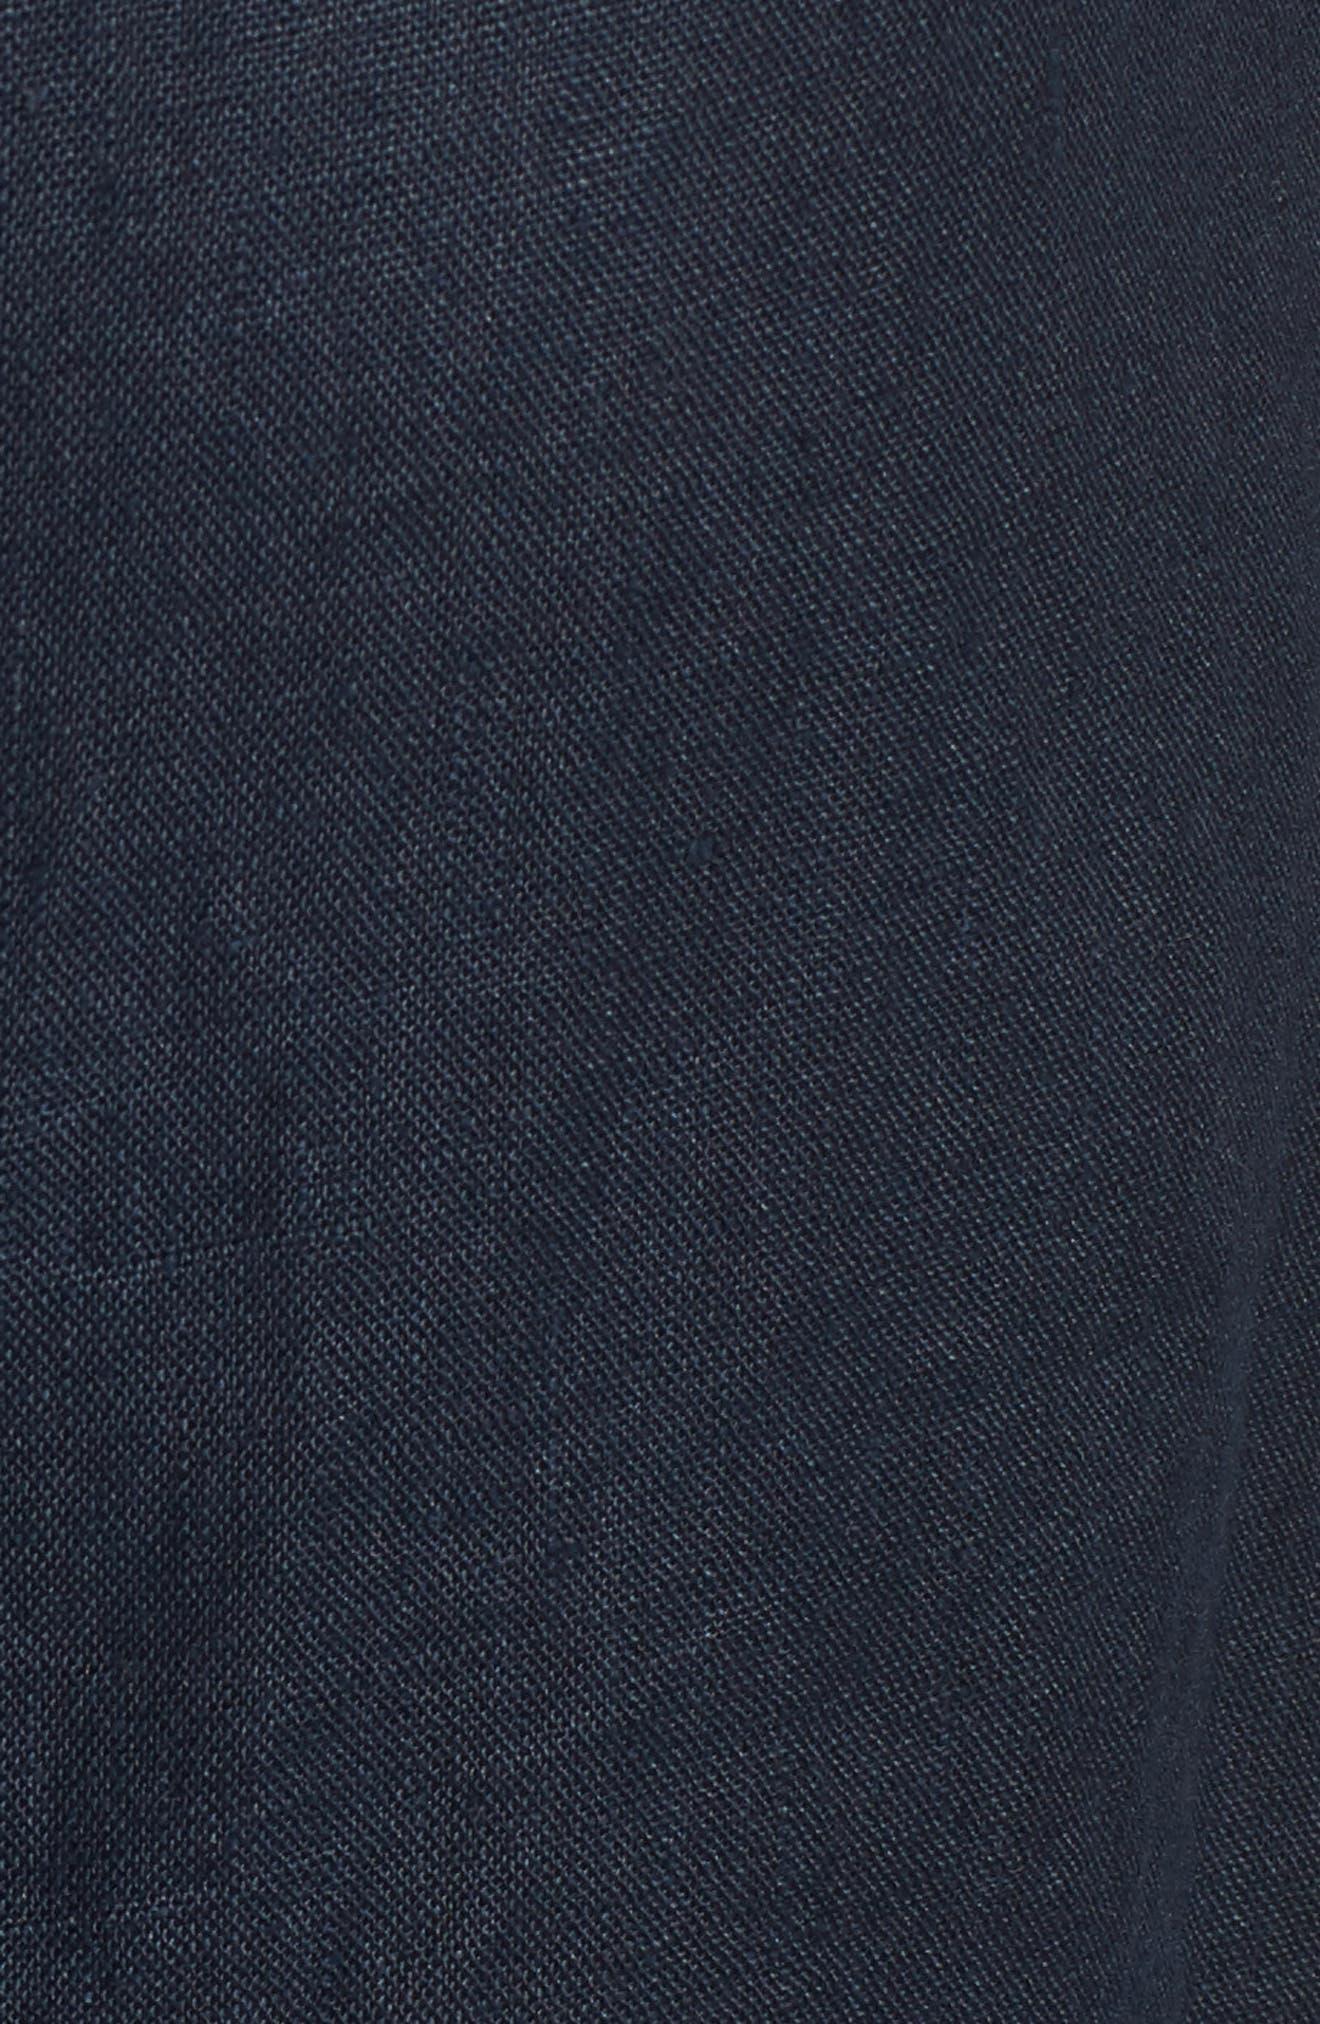 Le Roch Midi Dress,                             Alternate thumbnail 6, color,                             Plain Navy